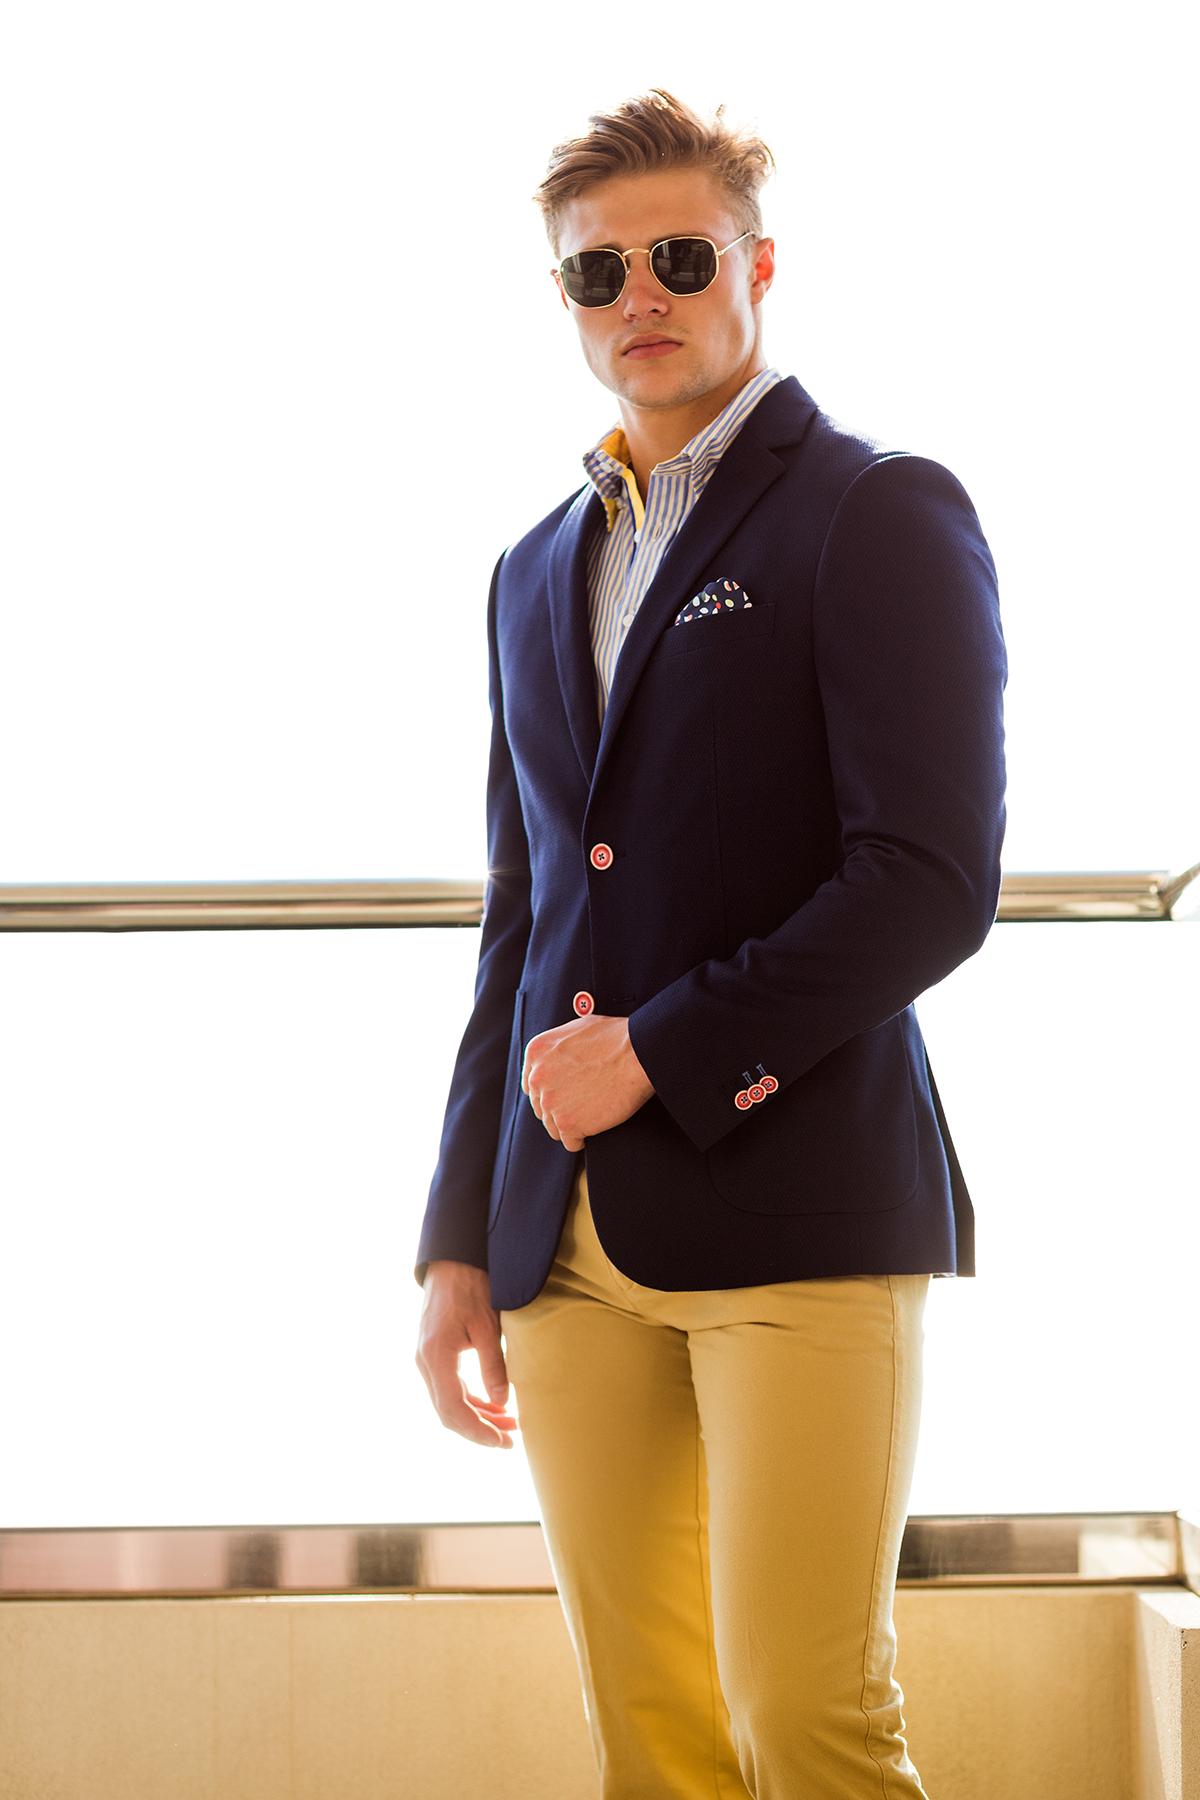 82f9c98c70e9 THIS OR THAT  Εσύ με τι θα φορούσες το μπλε unconstracted σακάκι σου  Με  ένα ριγέ hidden button-down πουκάμισο ή με ένα polo μπλουζάκι